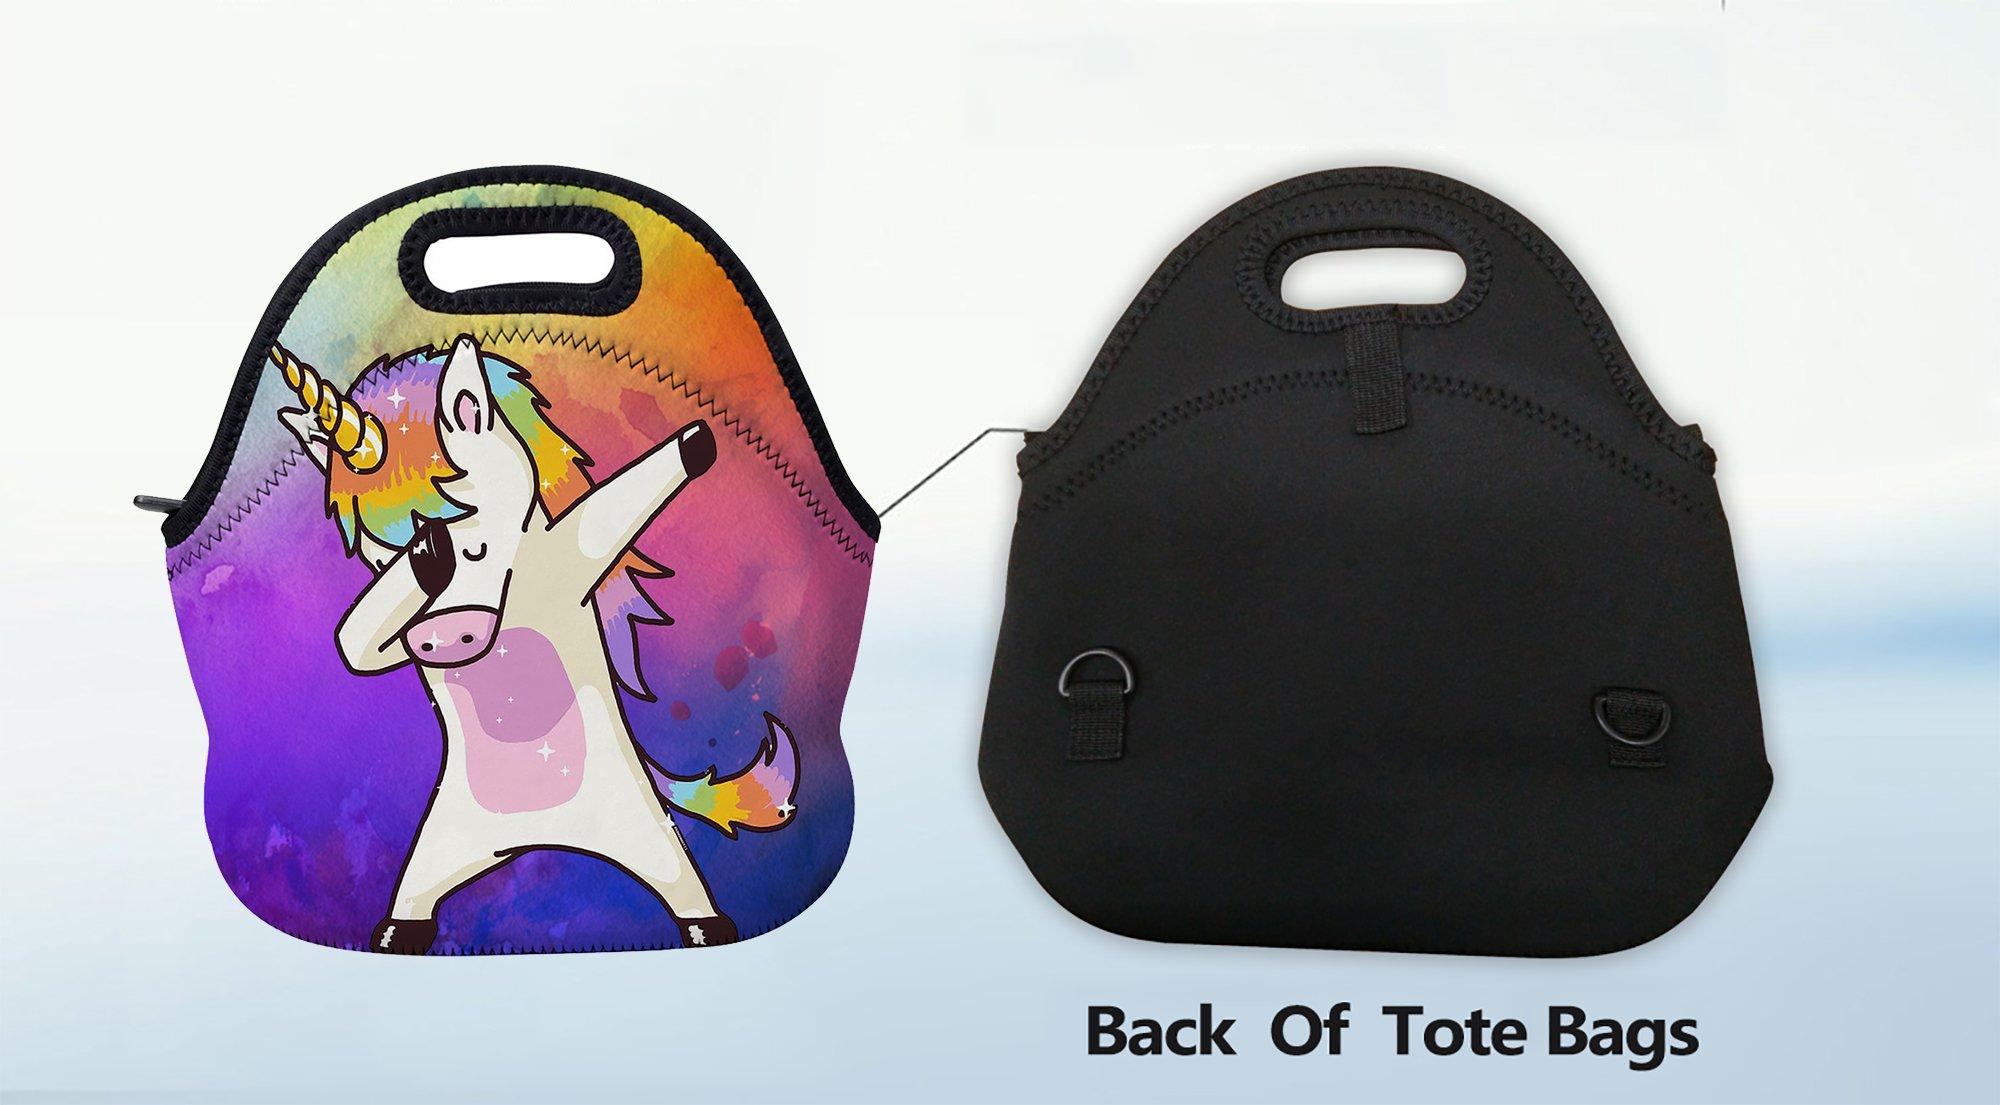 AOTIGO Dab Unicorn Rainbow Lunch Bag Insulated Neoprene Lunch Box Waterproof Tote Bag with Zipper for Kids, Boys, Girls… 8